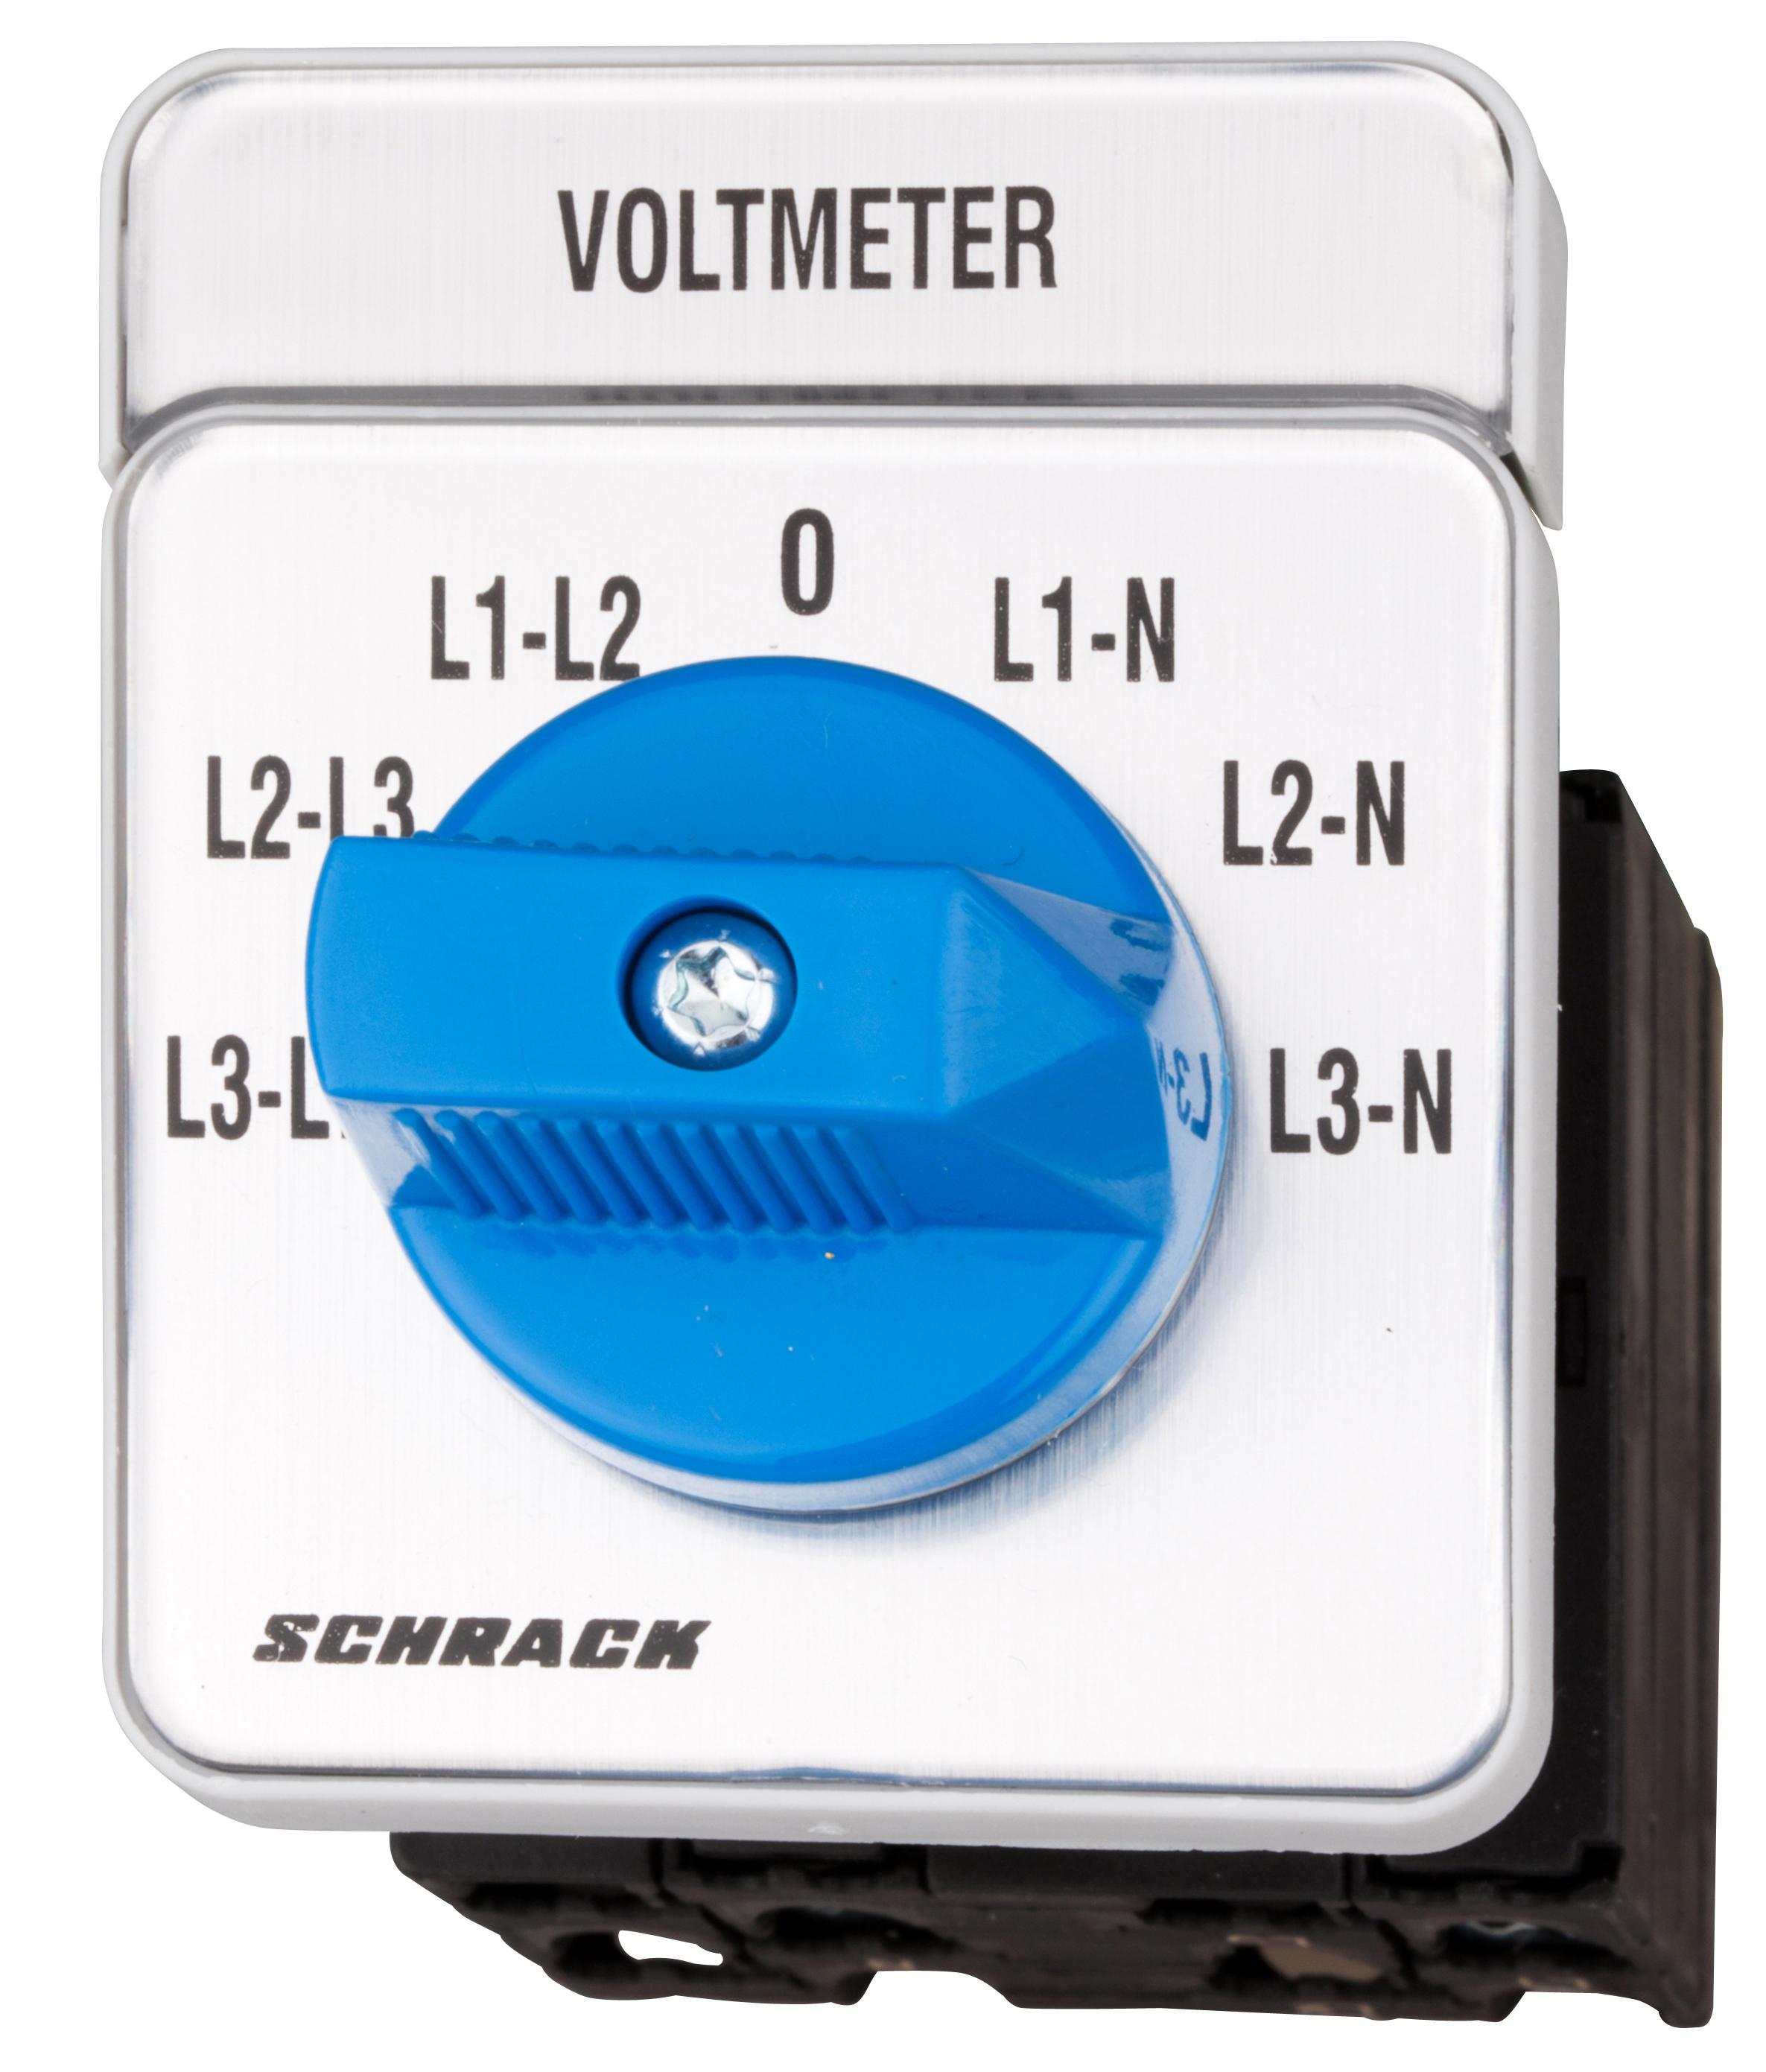 1 Stk Voltmeter-Umschalter 3 x L-L / 3 x L-N, Zentralbefestigung IN009V02--